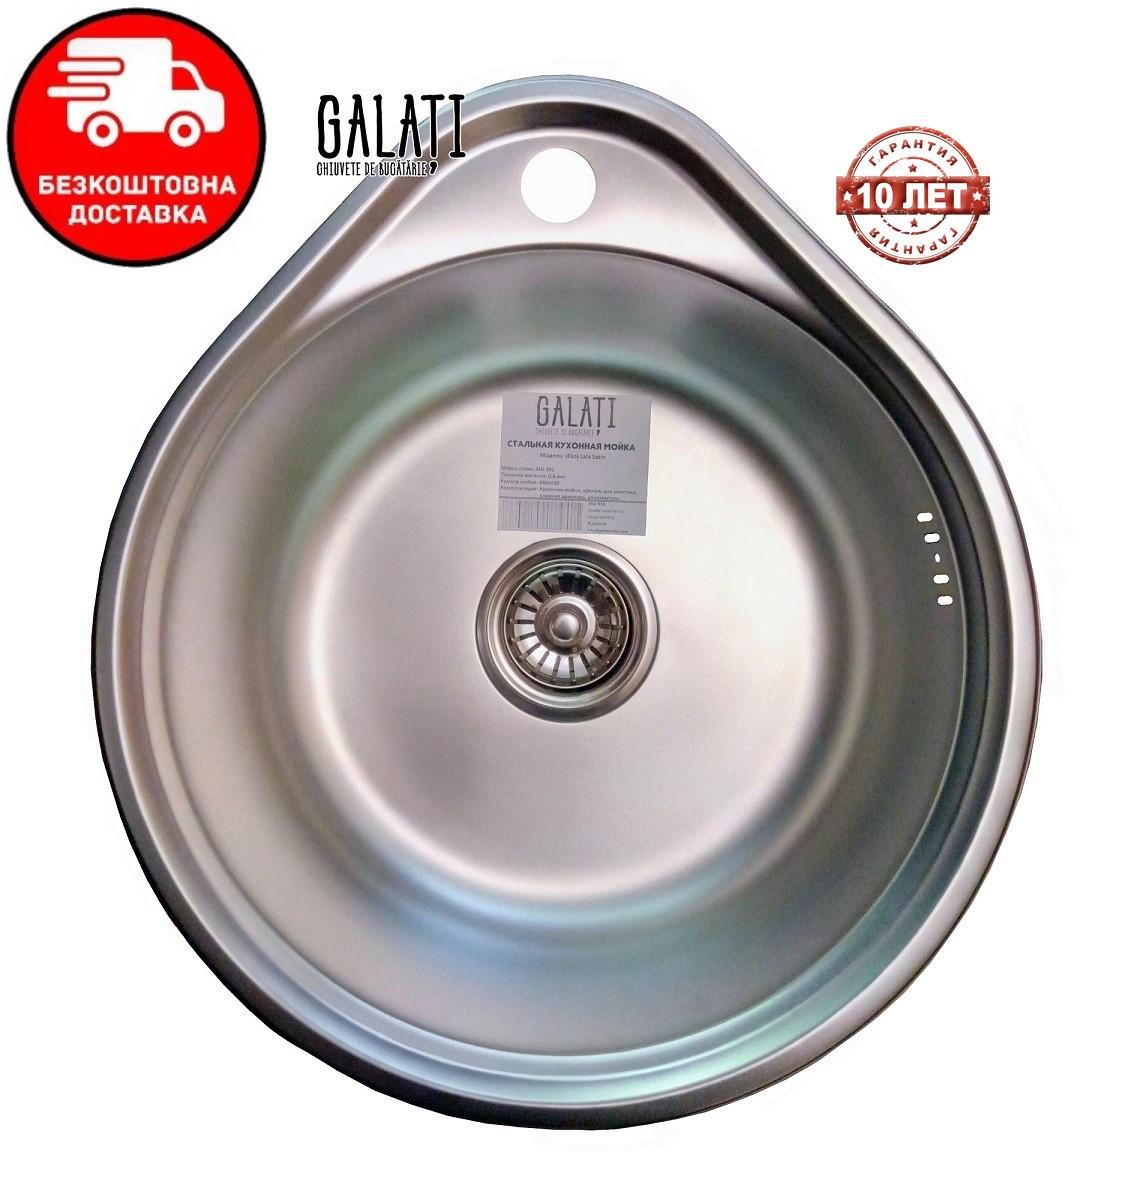 Кухонная мойка Galati (Eko) Lala Satin